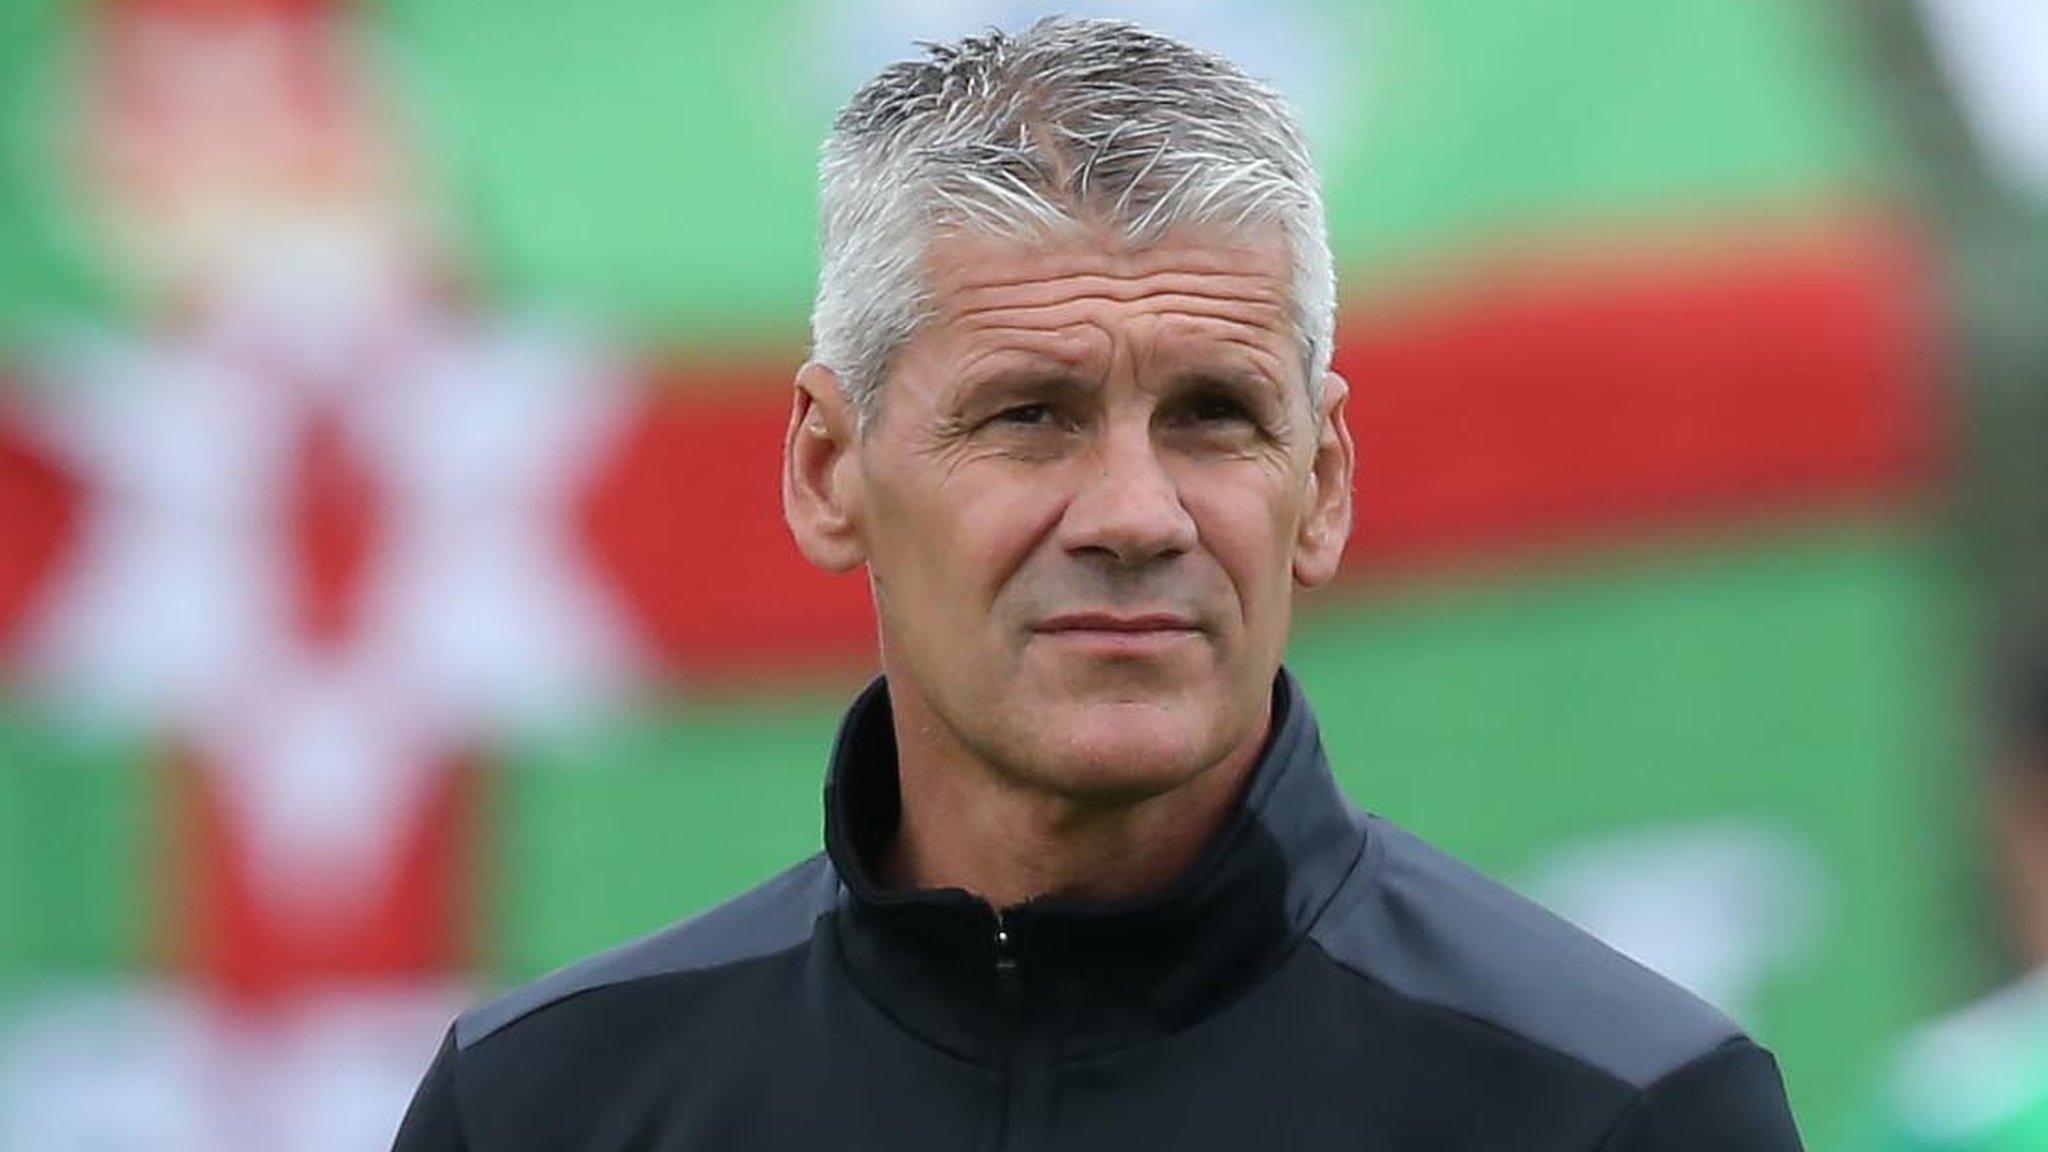 Irish Premiership: Gary Smyth parts company with Glentoran